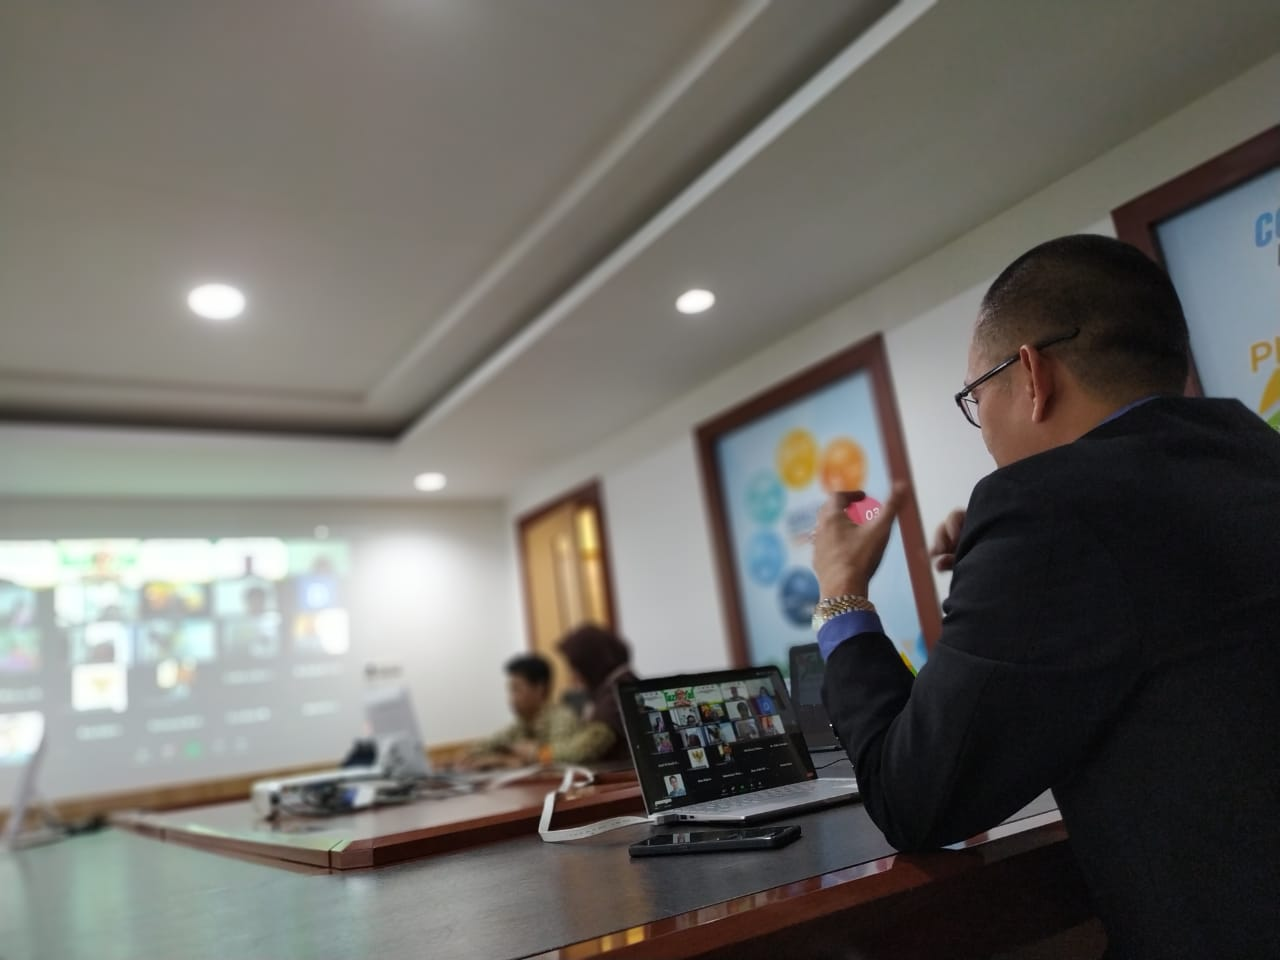 WhatsApp Image 2020 06 16 at 11.31.33 Launching Raksa Nugraha Award 2020, Tazkiyah Beri Testimoni Bersama Tiga BUMN